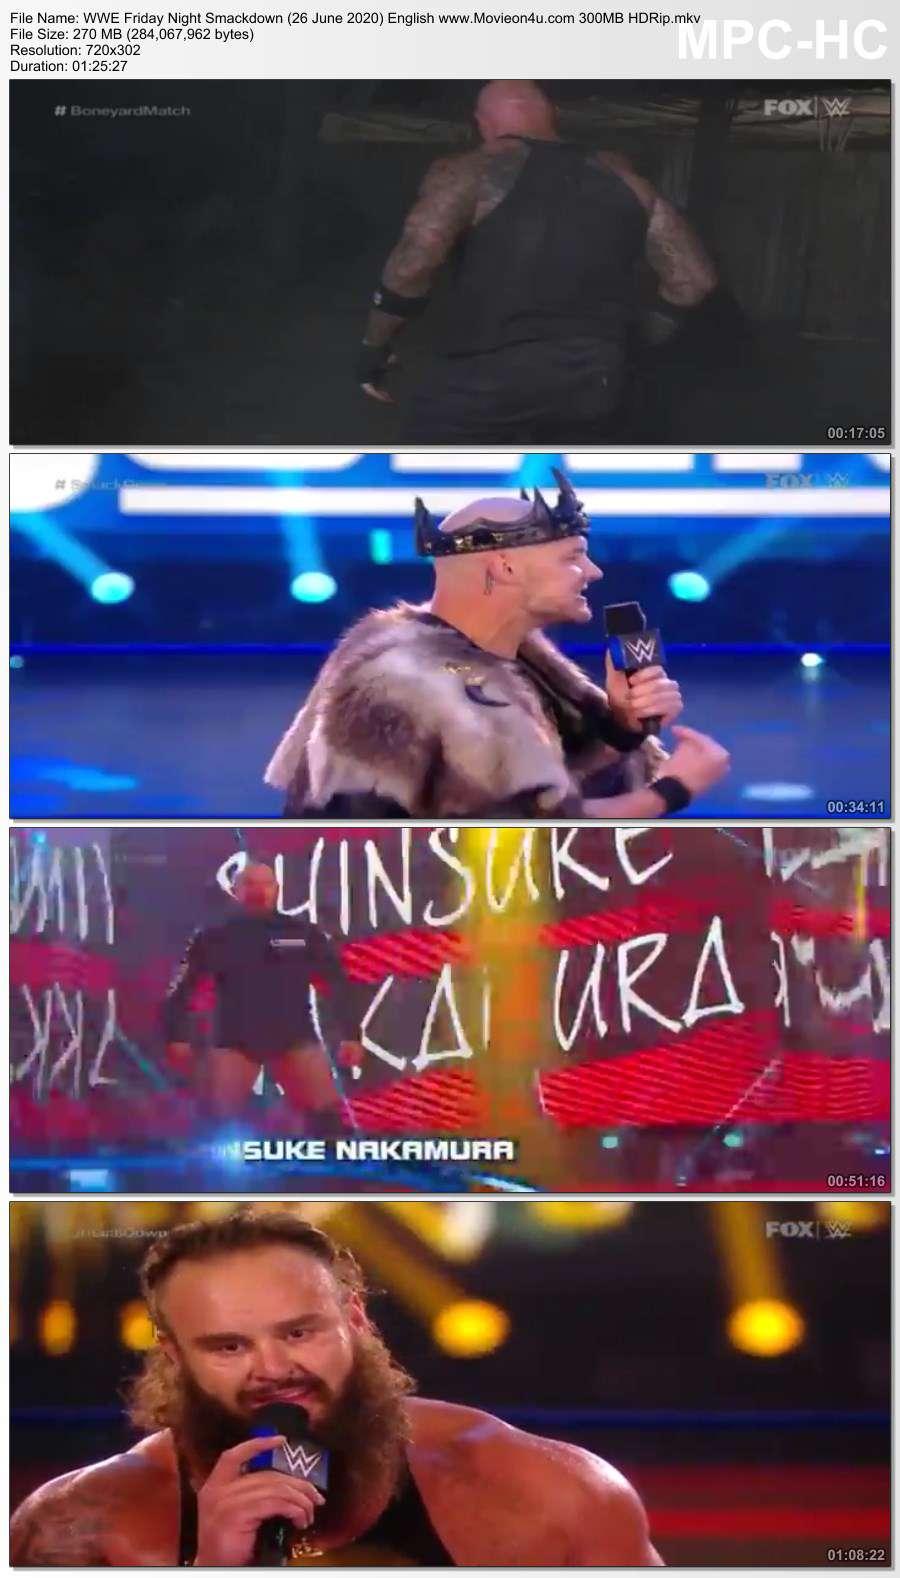 WWE Friday Night Smackdown (26 June 2020) English 300MB HDRip x264 480p Download HD